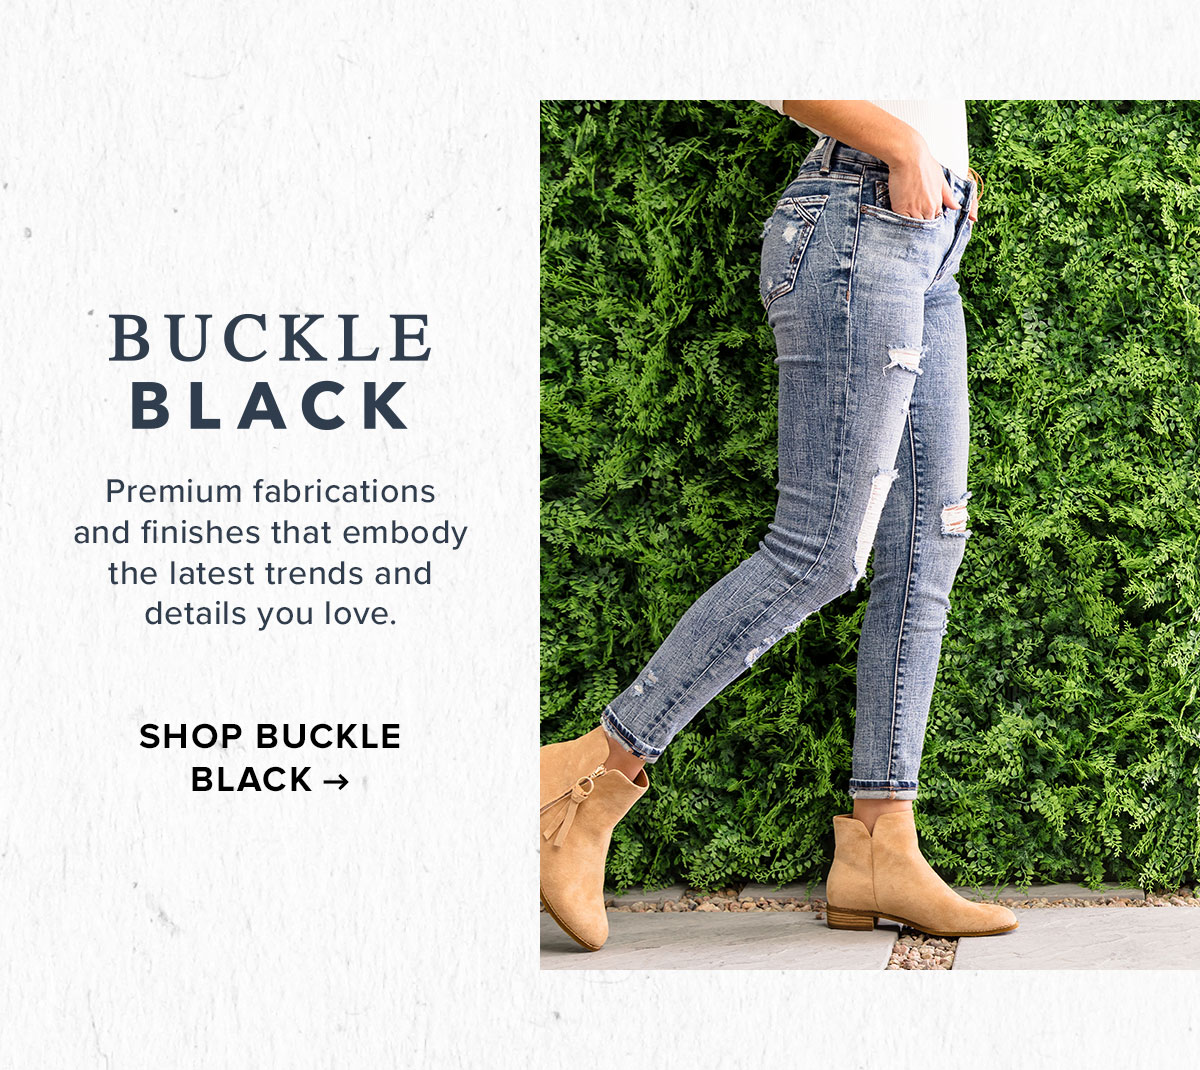 Shop Women's Buckle Black